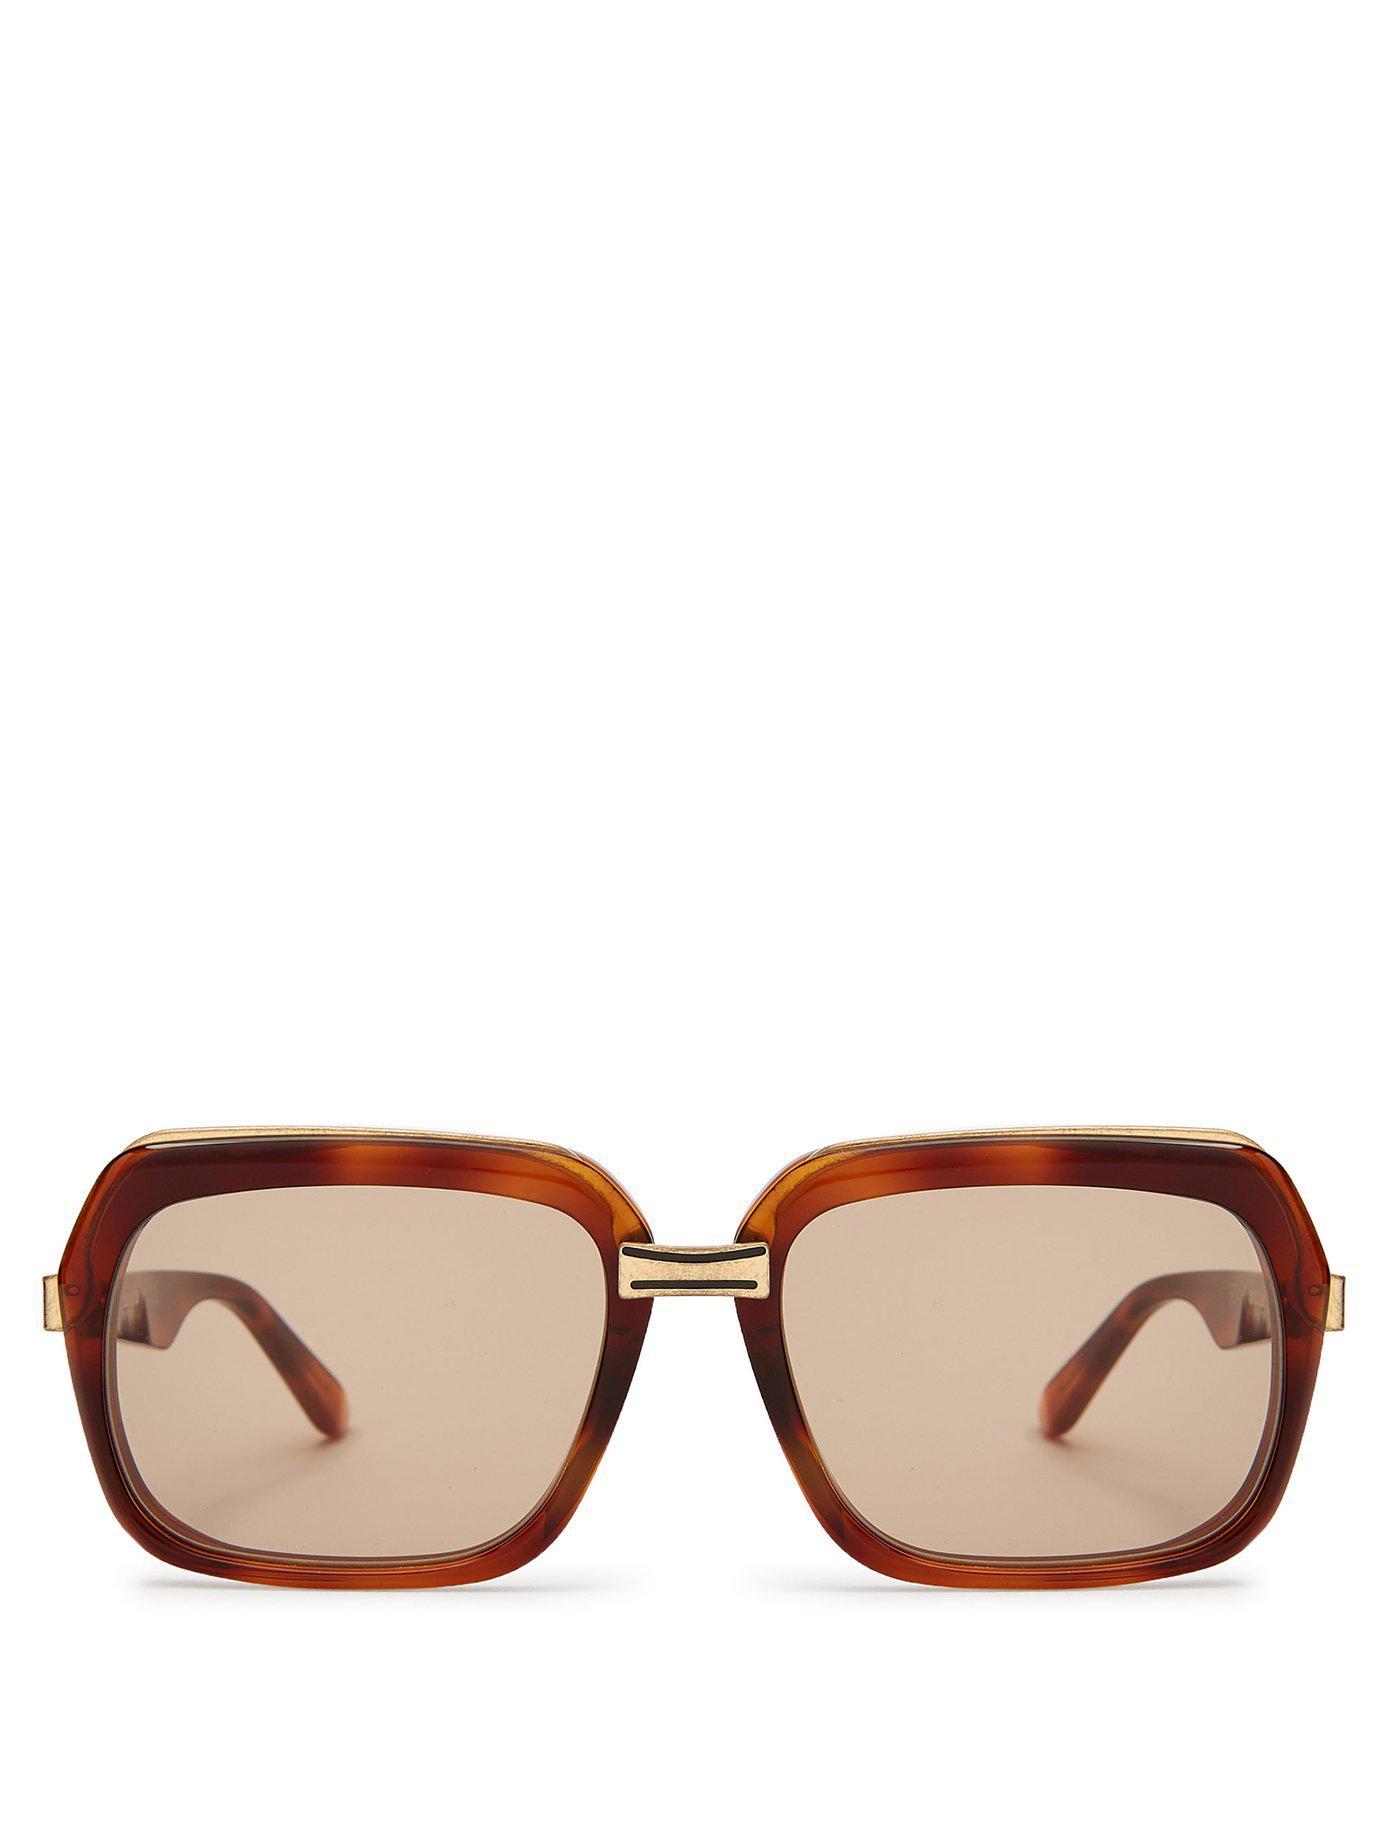 6e8c95b1290 Céline. Women s Oversized Square Frame Acetate Sunglasses